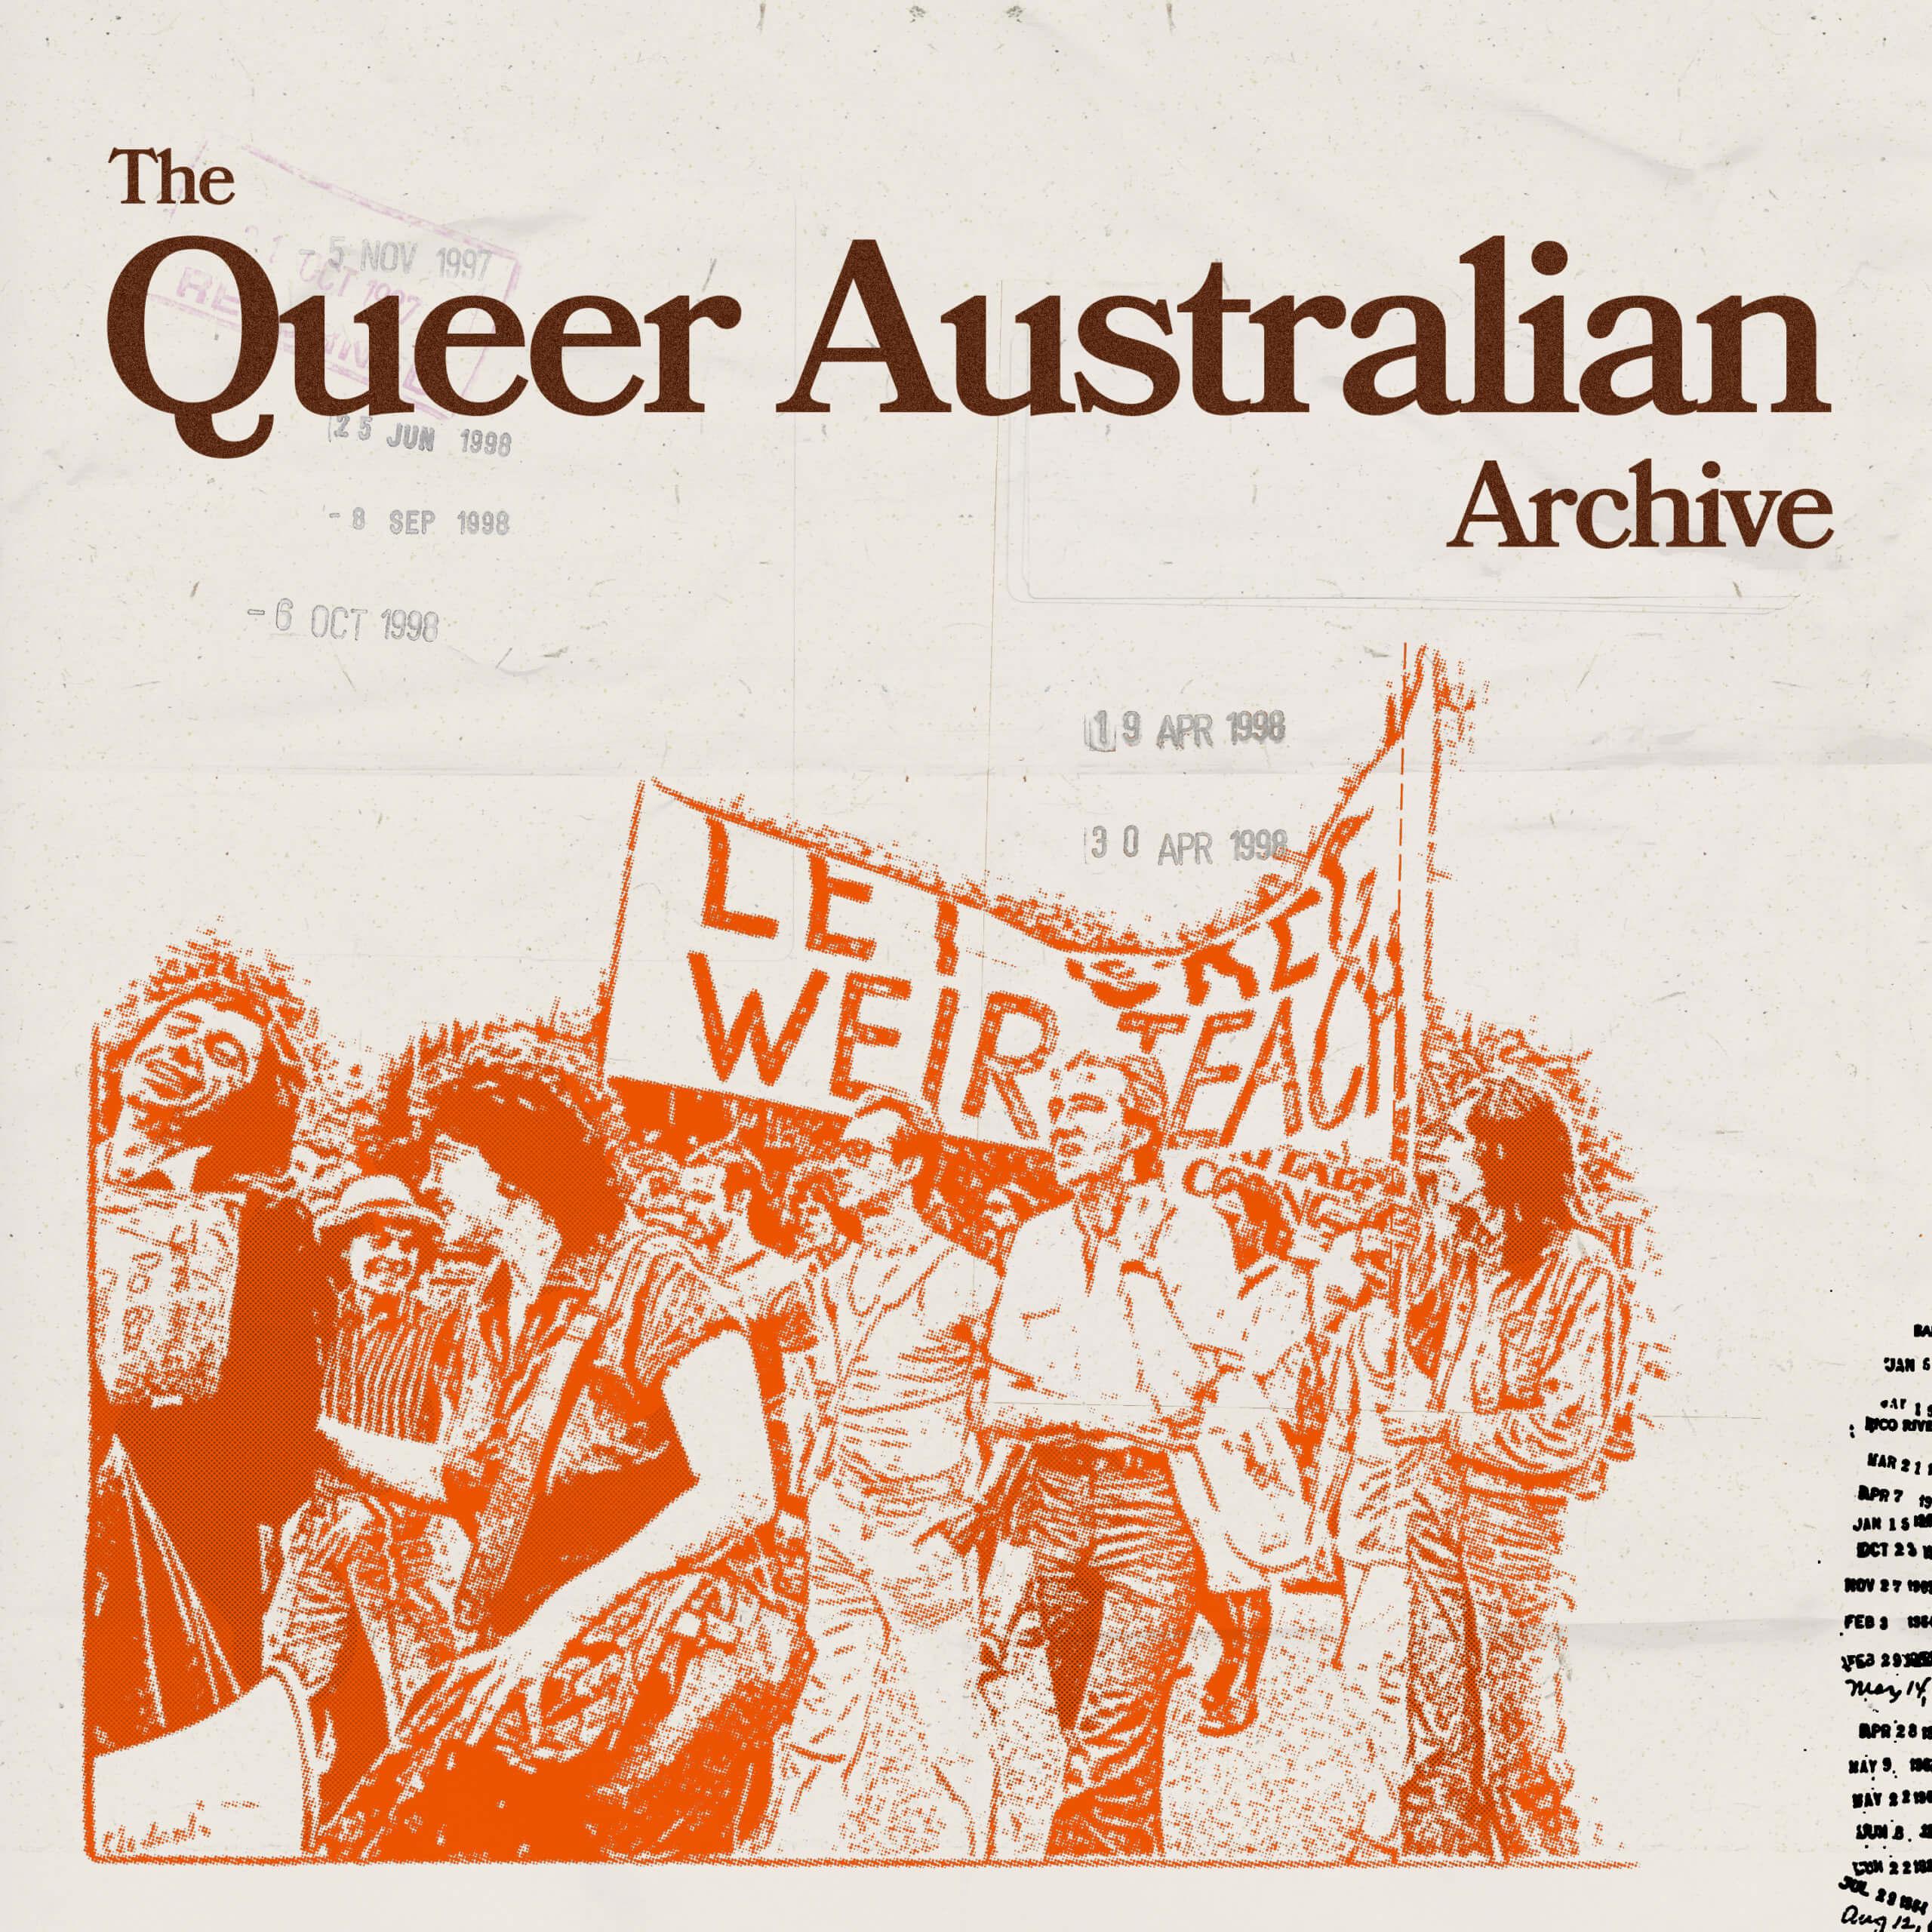 The Queer Australian Archive